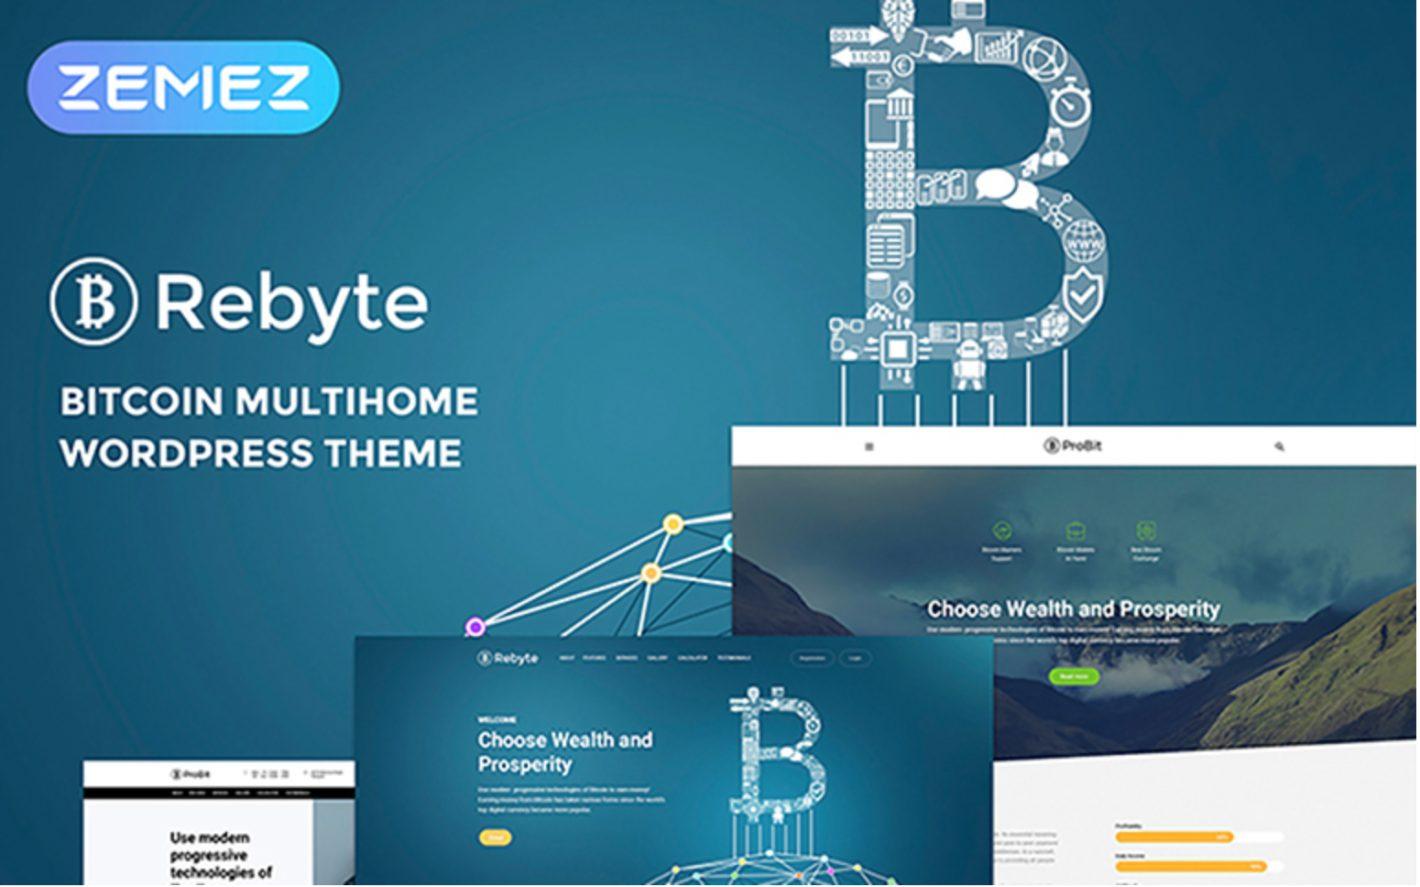 Rebyte WordPress Theme Free and Premium